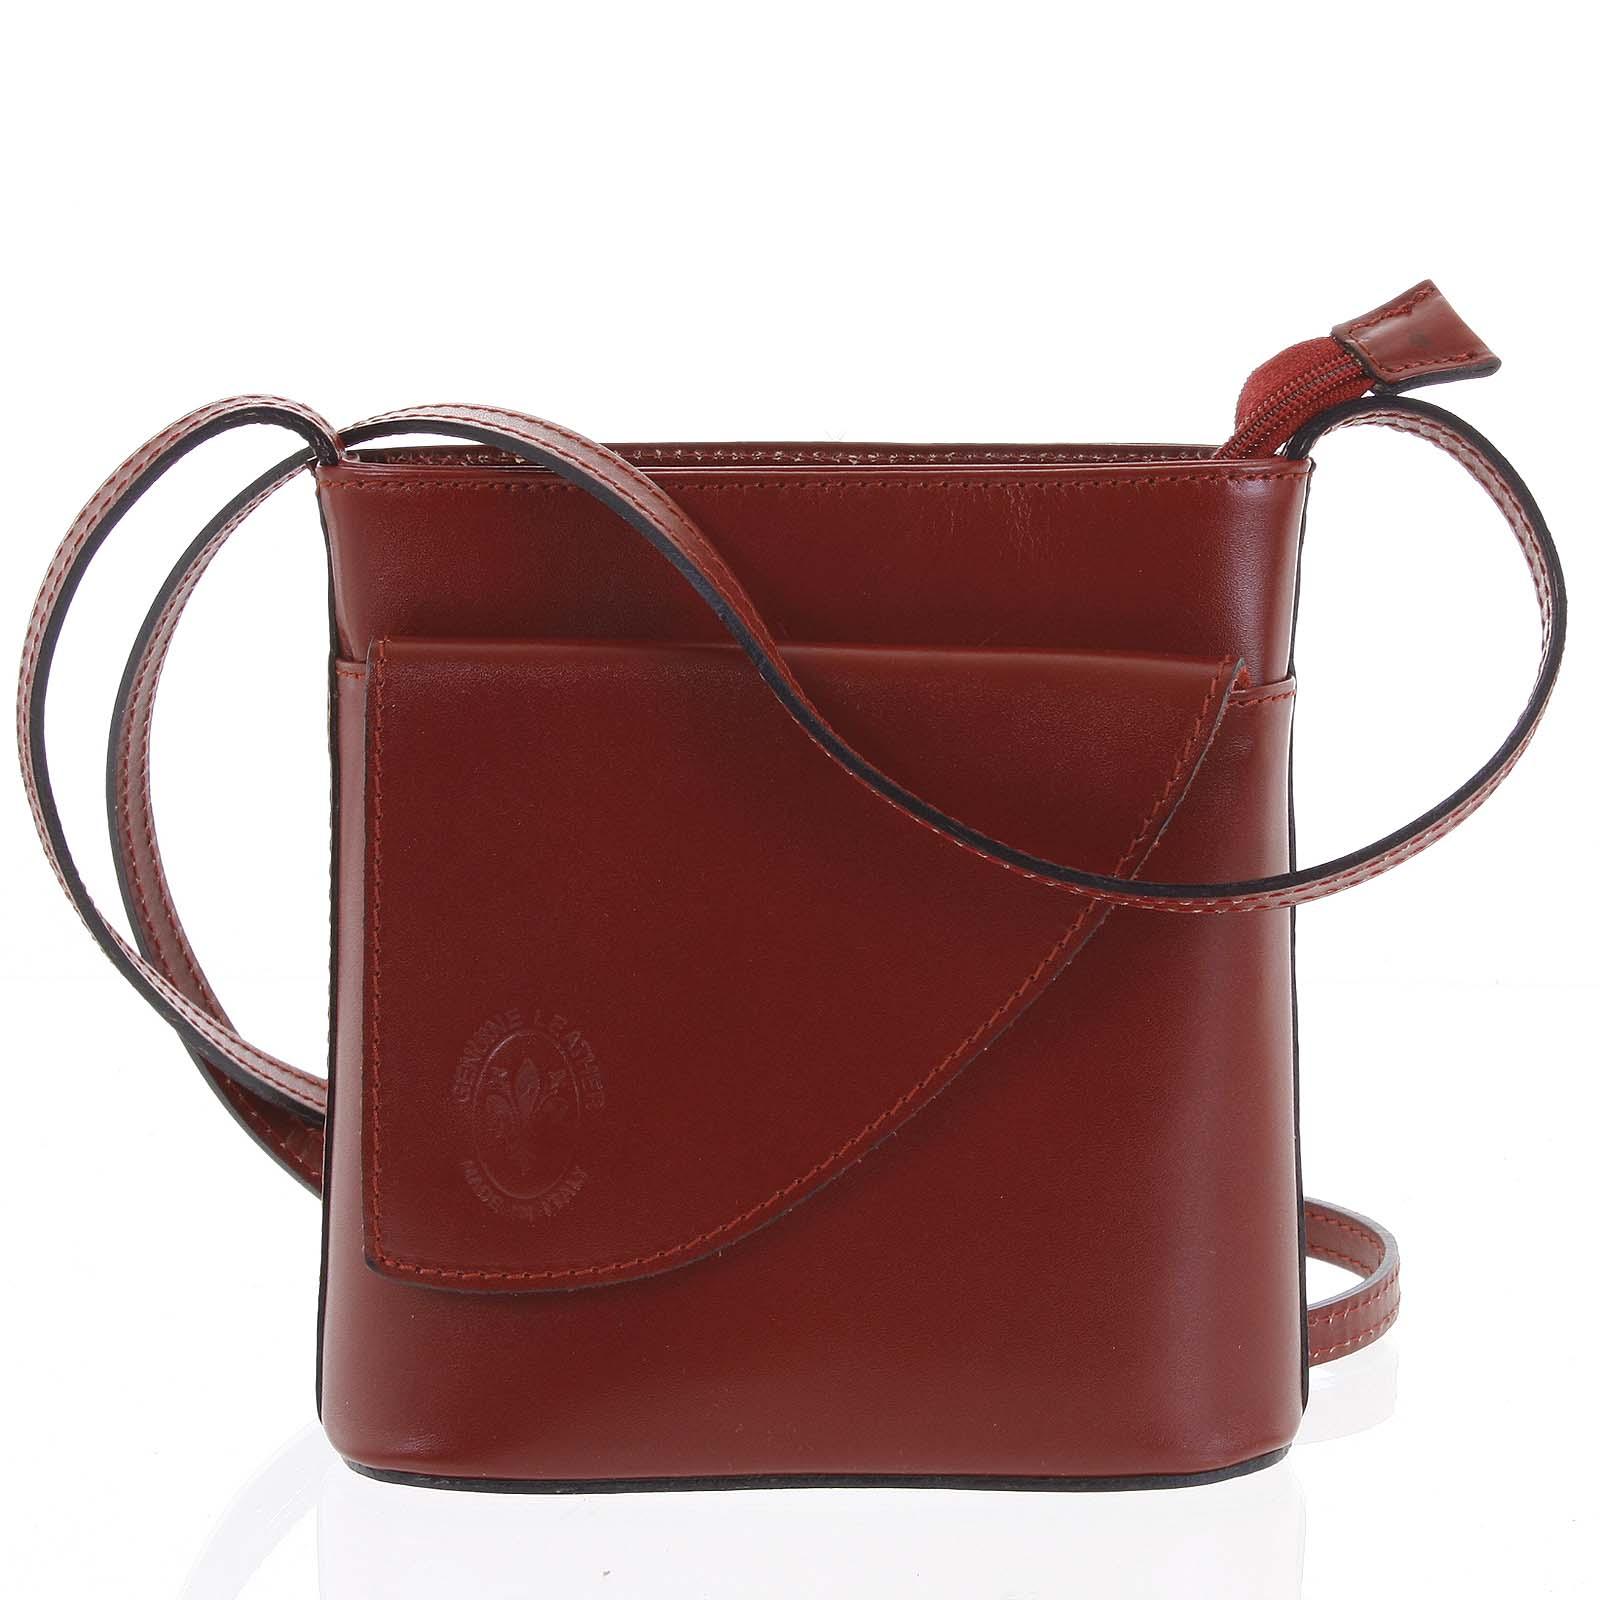 Dámská kožená crossbody kabelka červená - ItalY Cora Dark